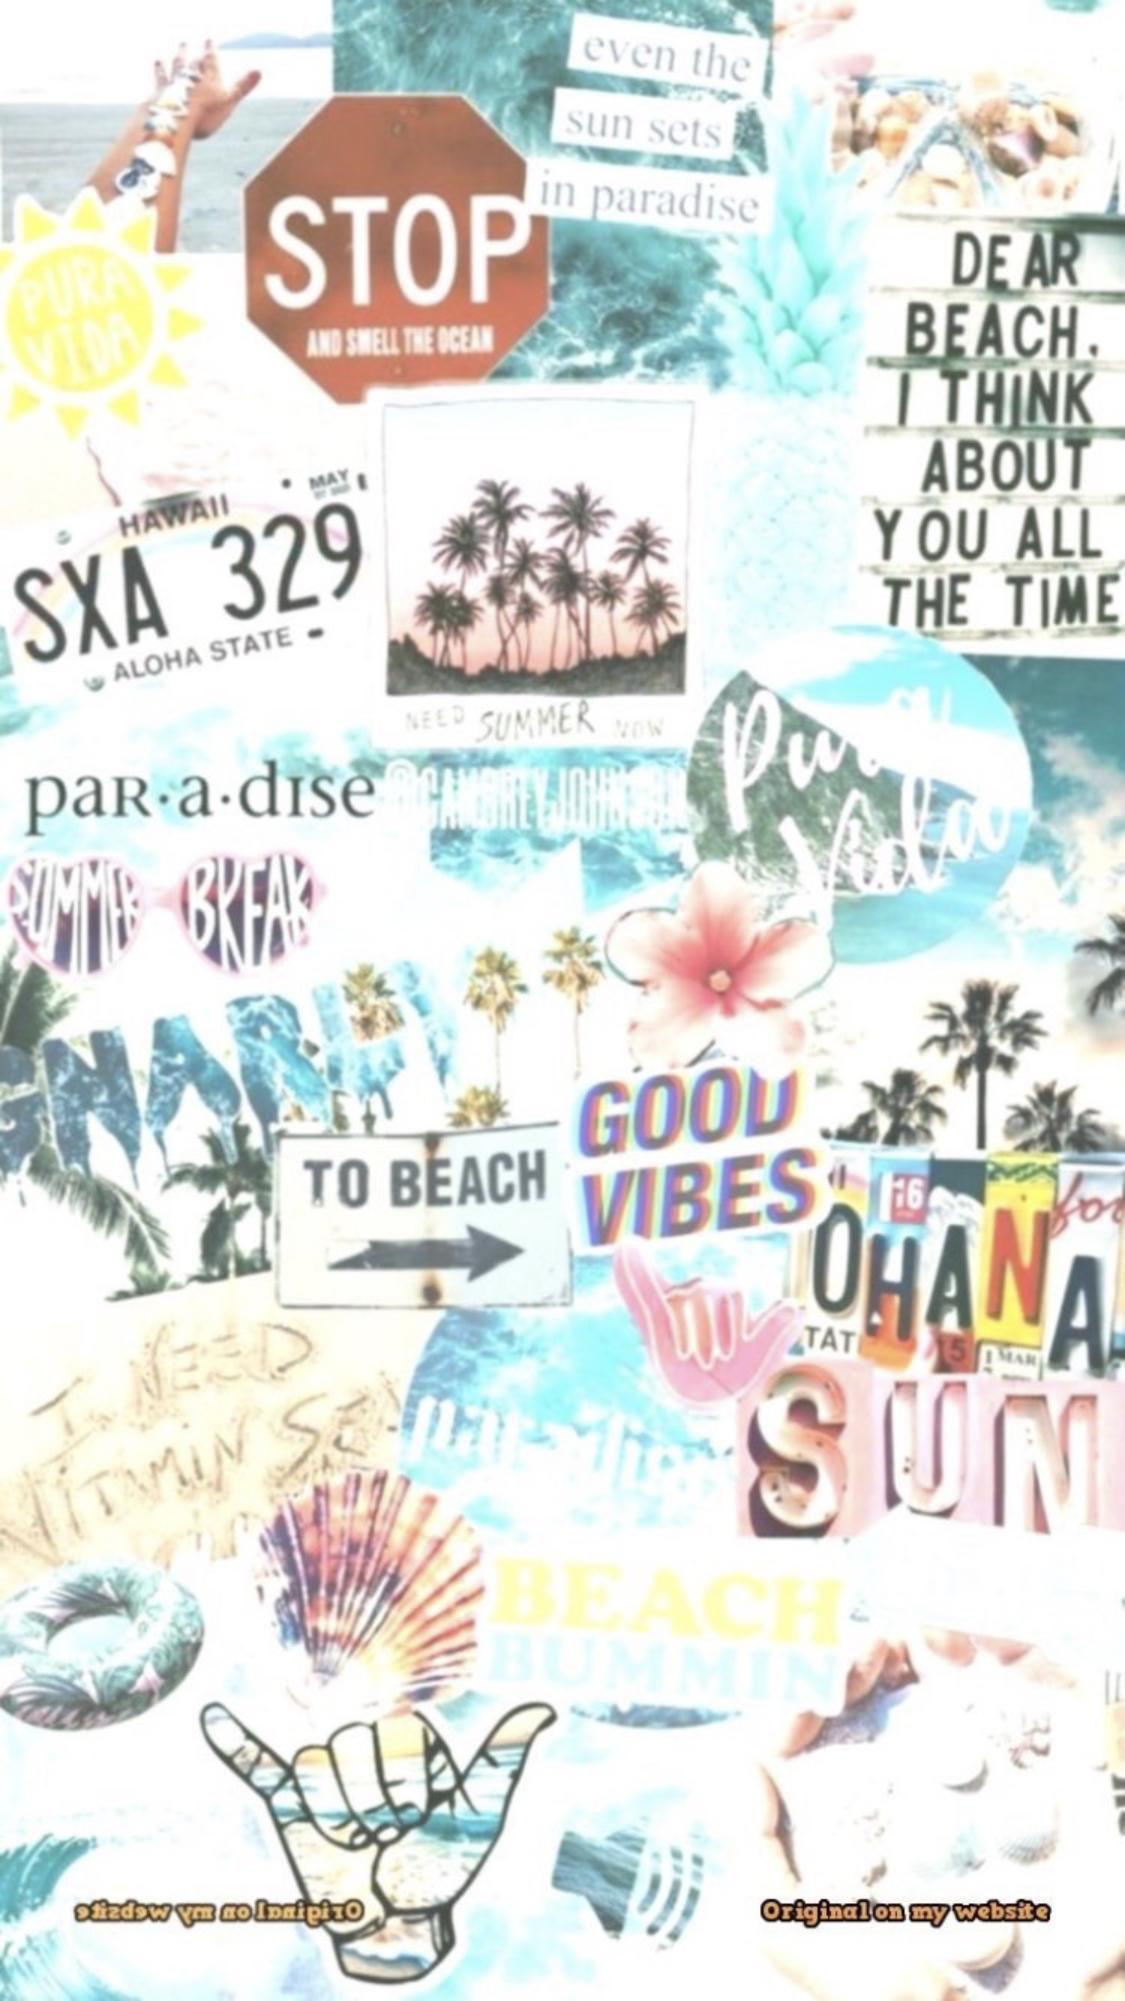 Pin By Radianny Vega On Wallpaper Wallpaper Iphone Summer Iphone Wallpaper Vsco Teal Wallpaper Iphone